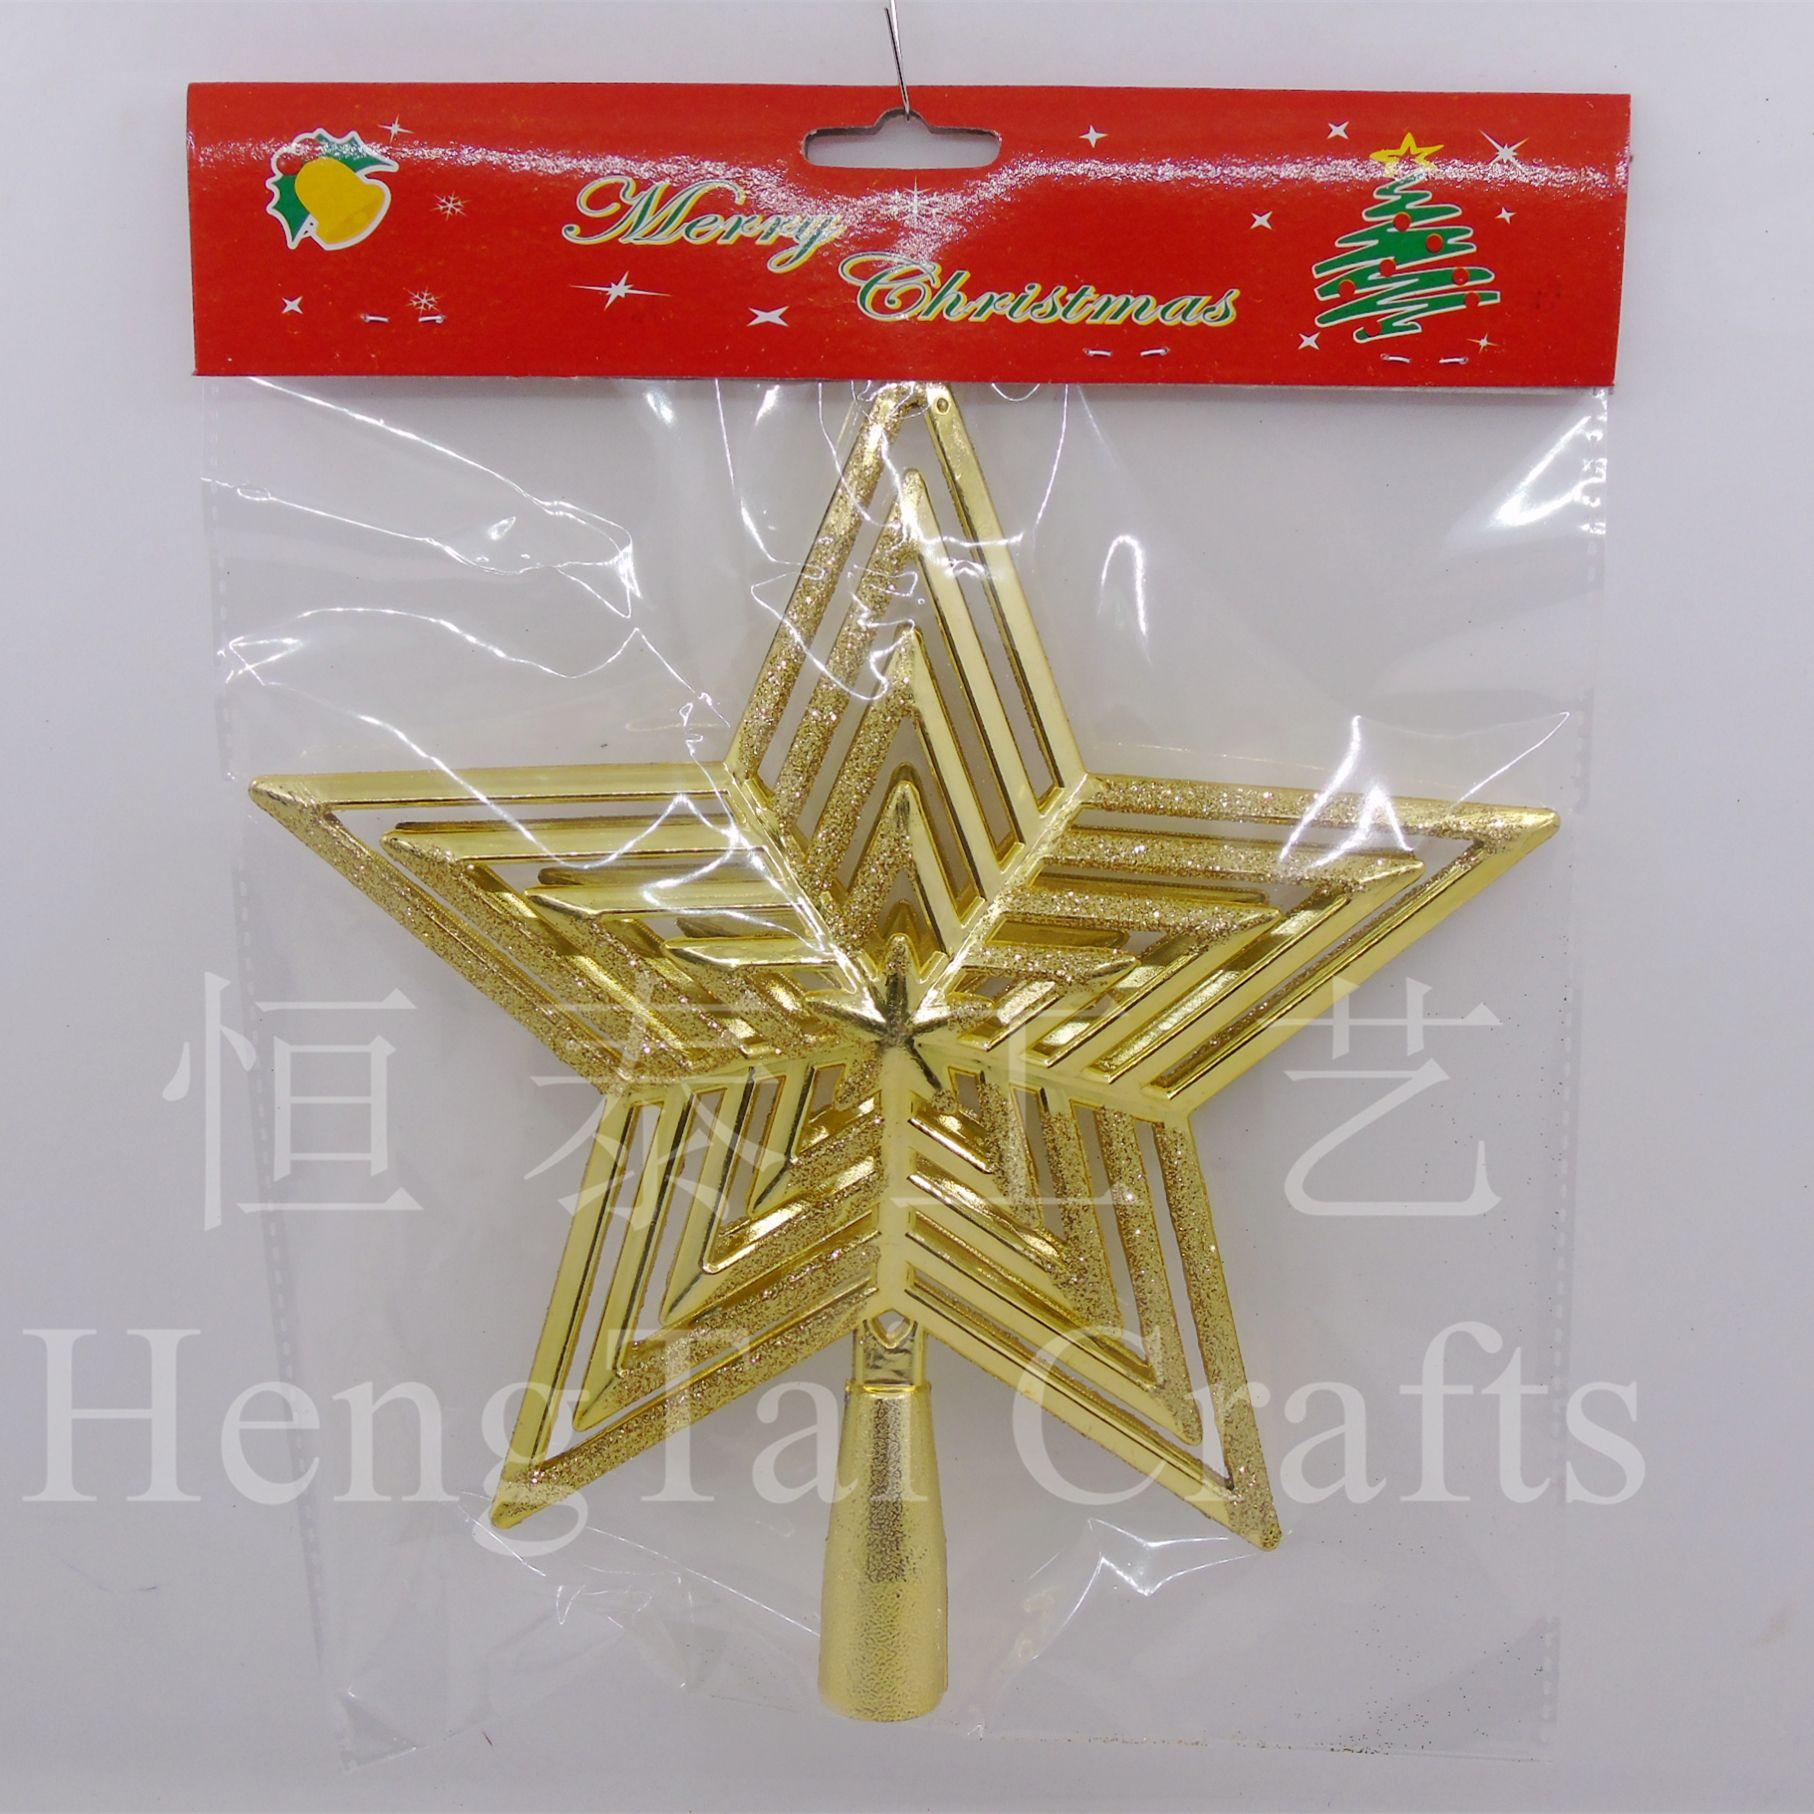 21X23CM圣诞电镀五星树顶装饰工艺品  LI-NN21209